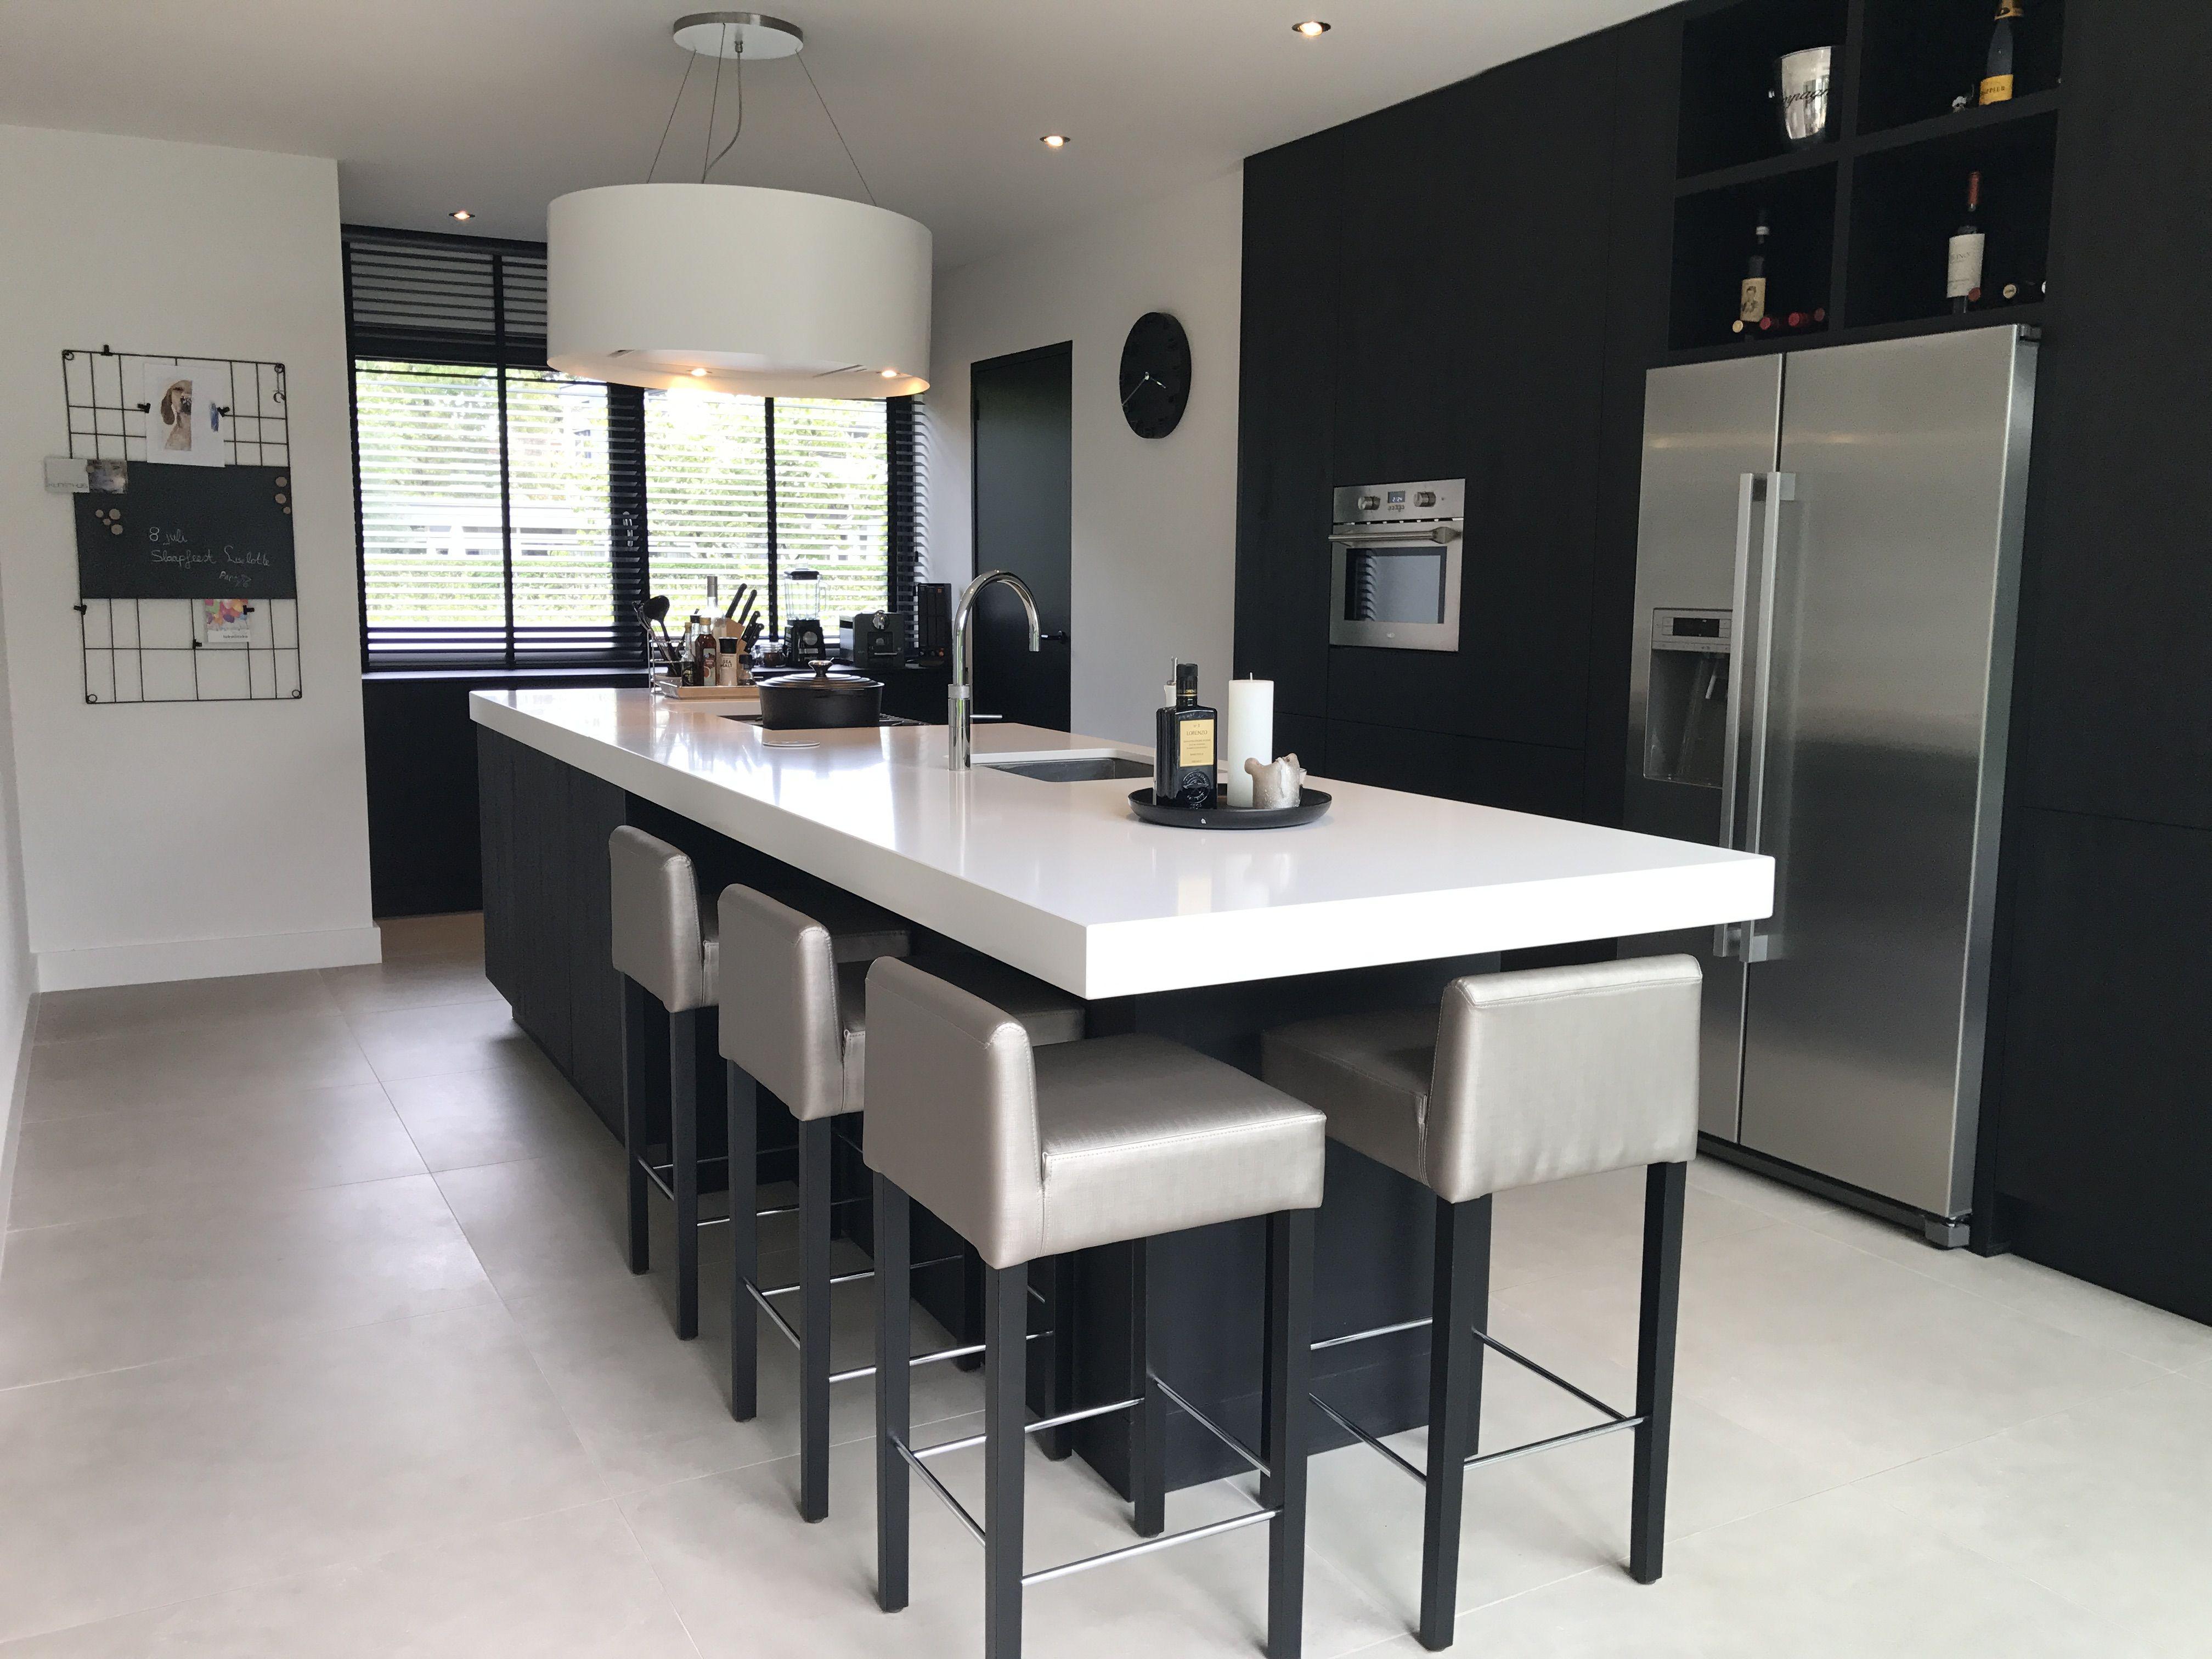 Keuken kookeiland zwart wit met bar afzuigkap wave boretti